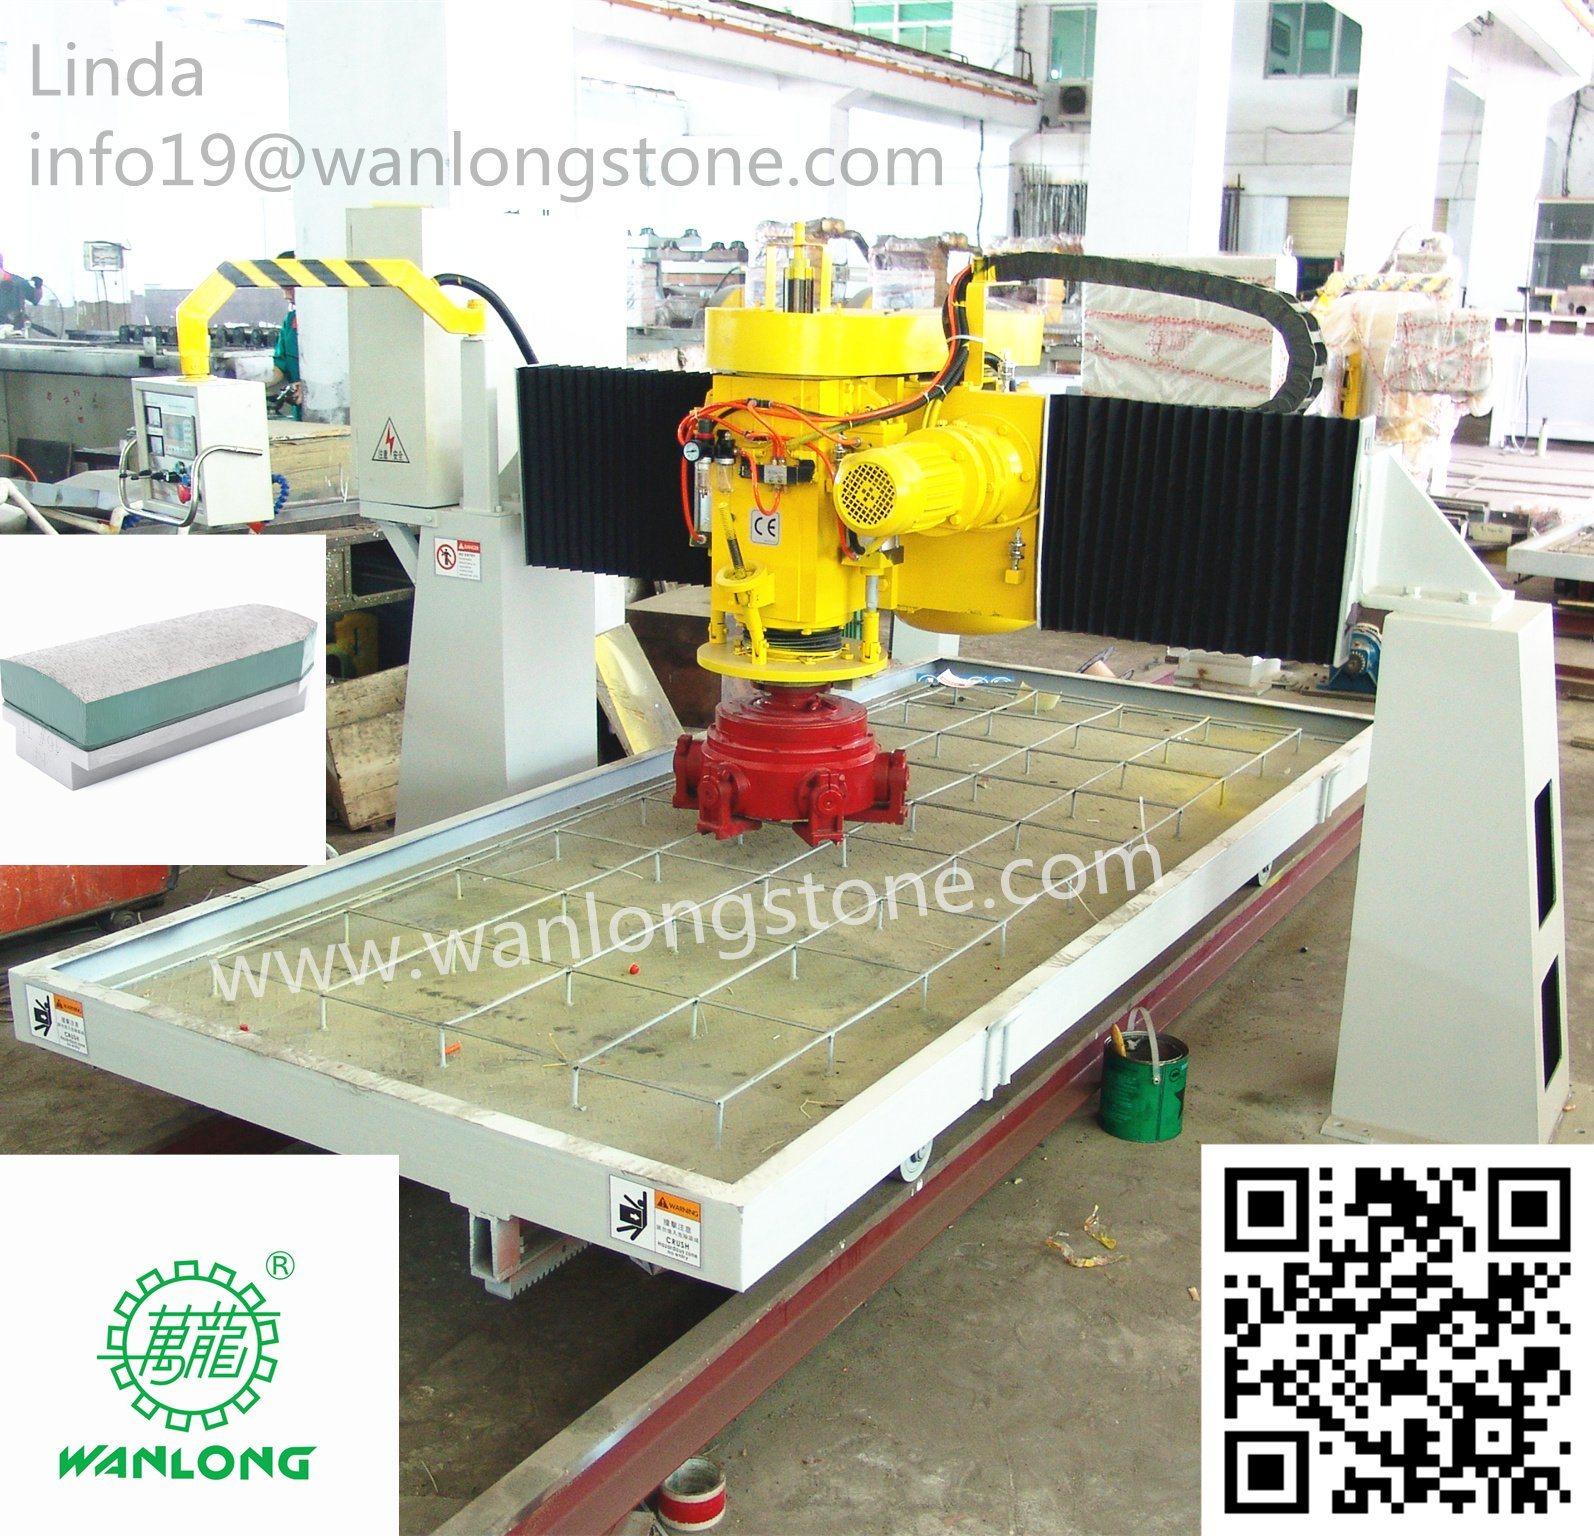 China Large Slab Automatic Marble Granite Floor Polishing Machine